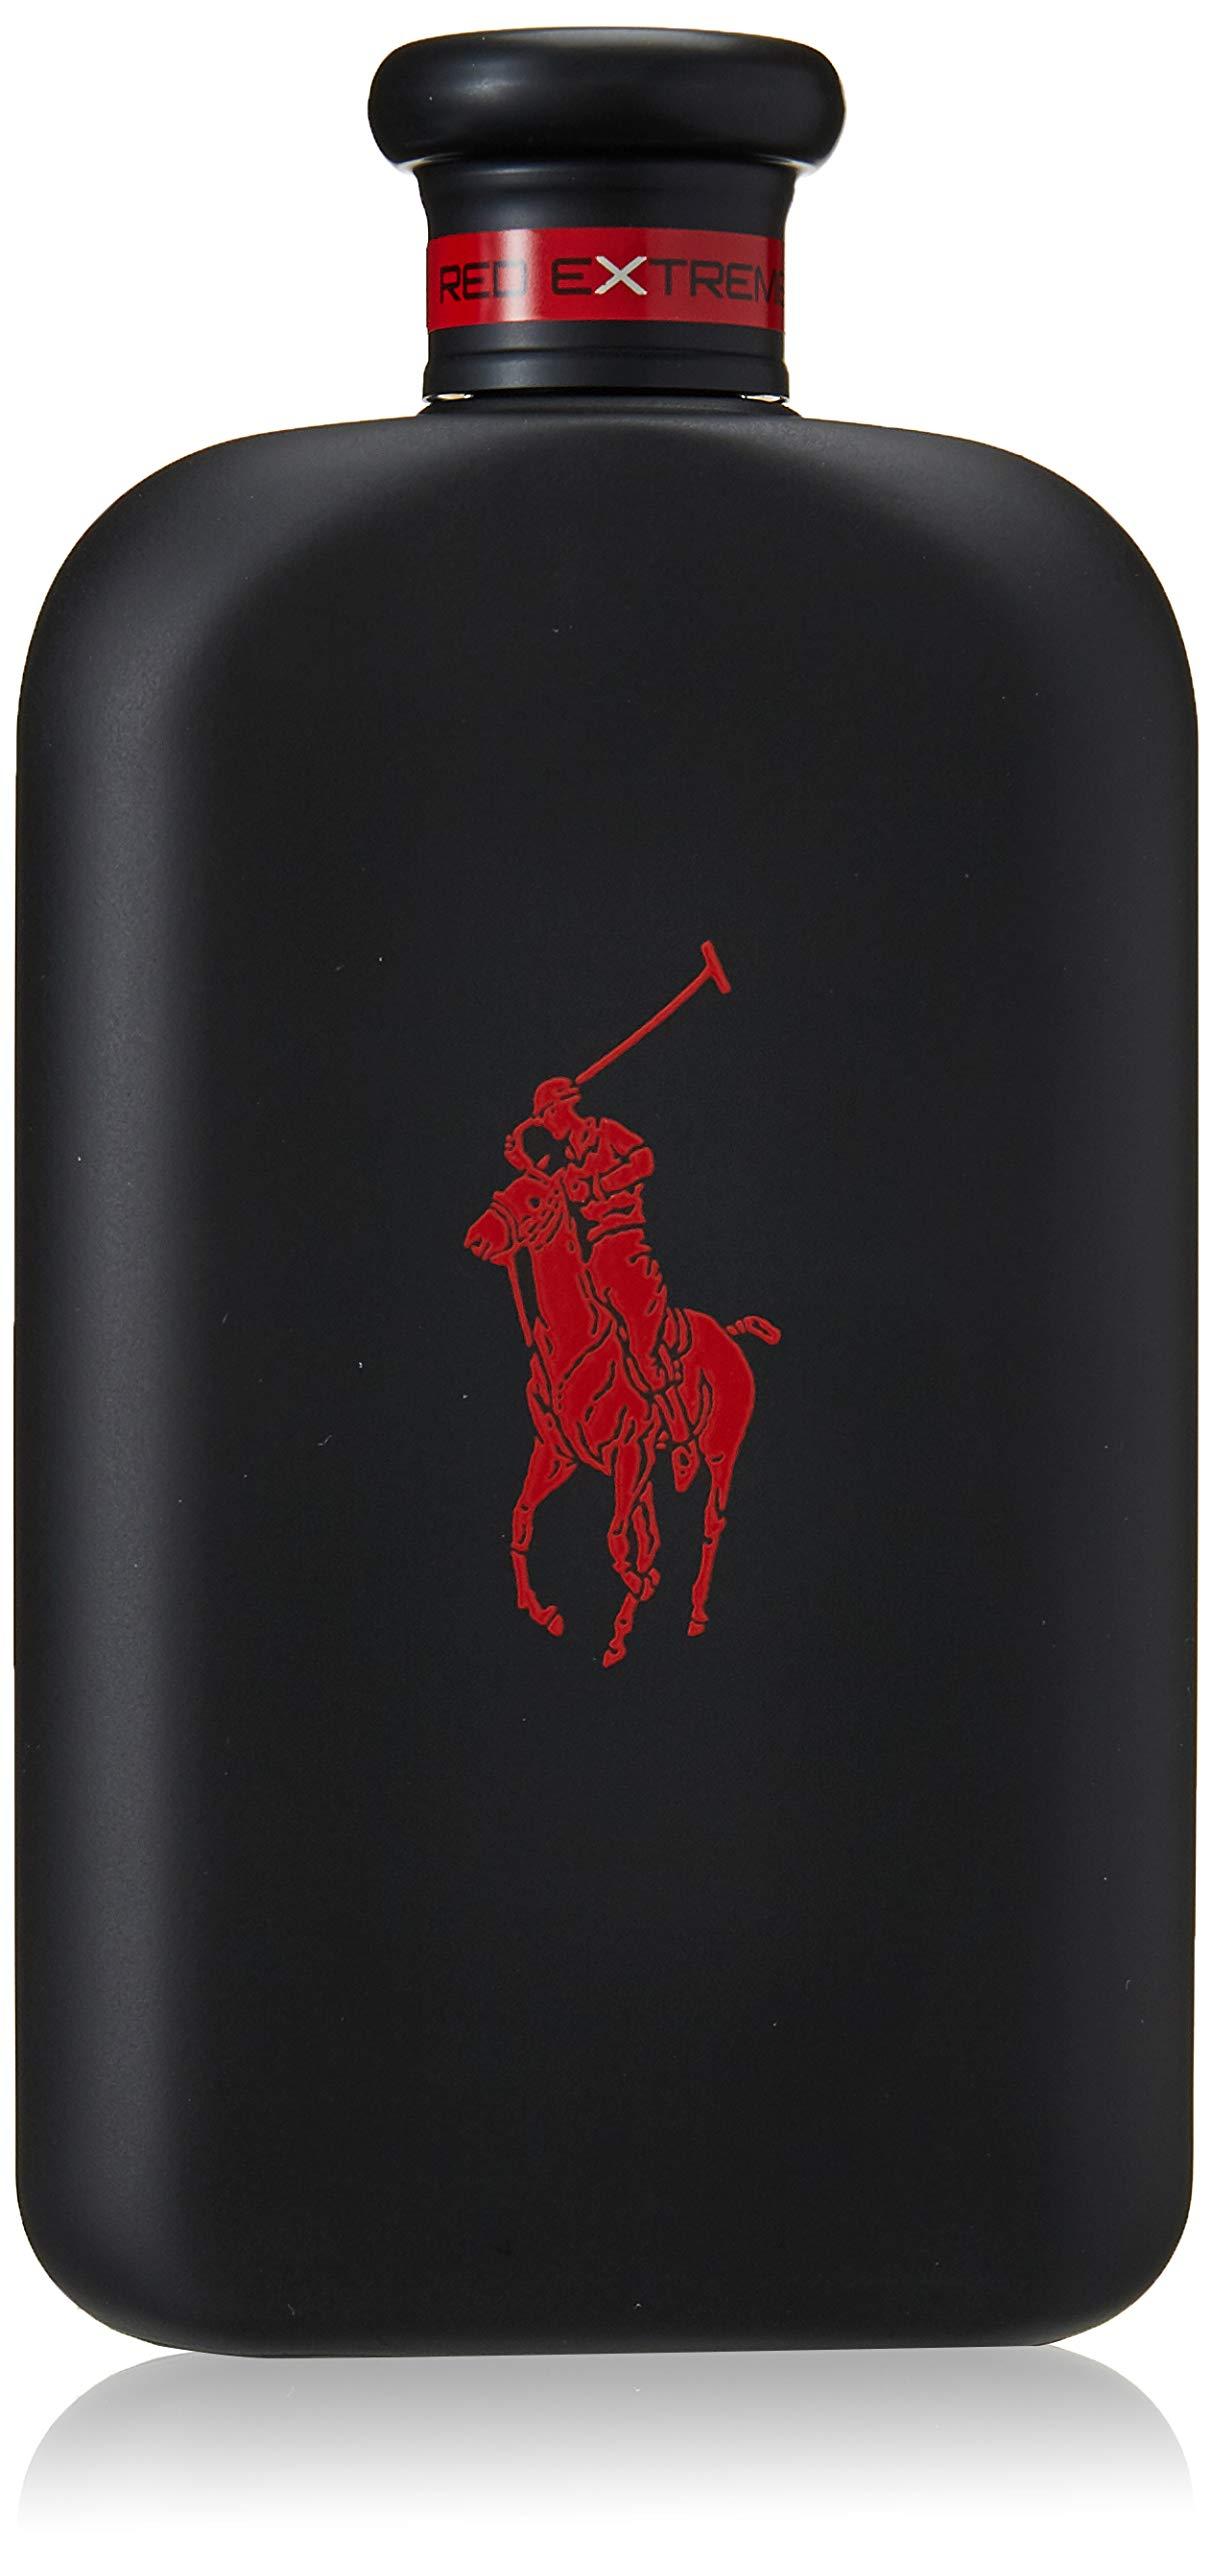 Ralph Lauren Polo Red Extreme for Men Parfum Spray, 6.7 Ounce, black